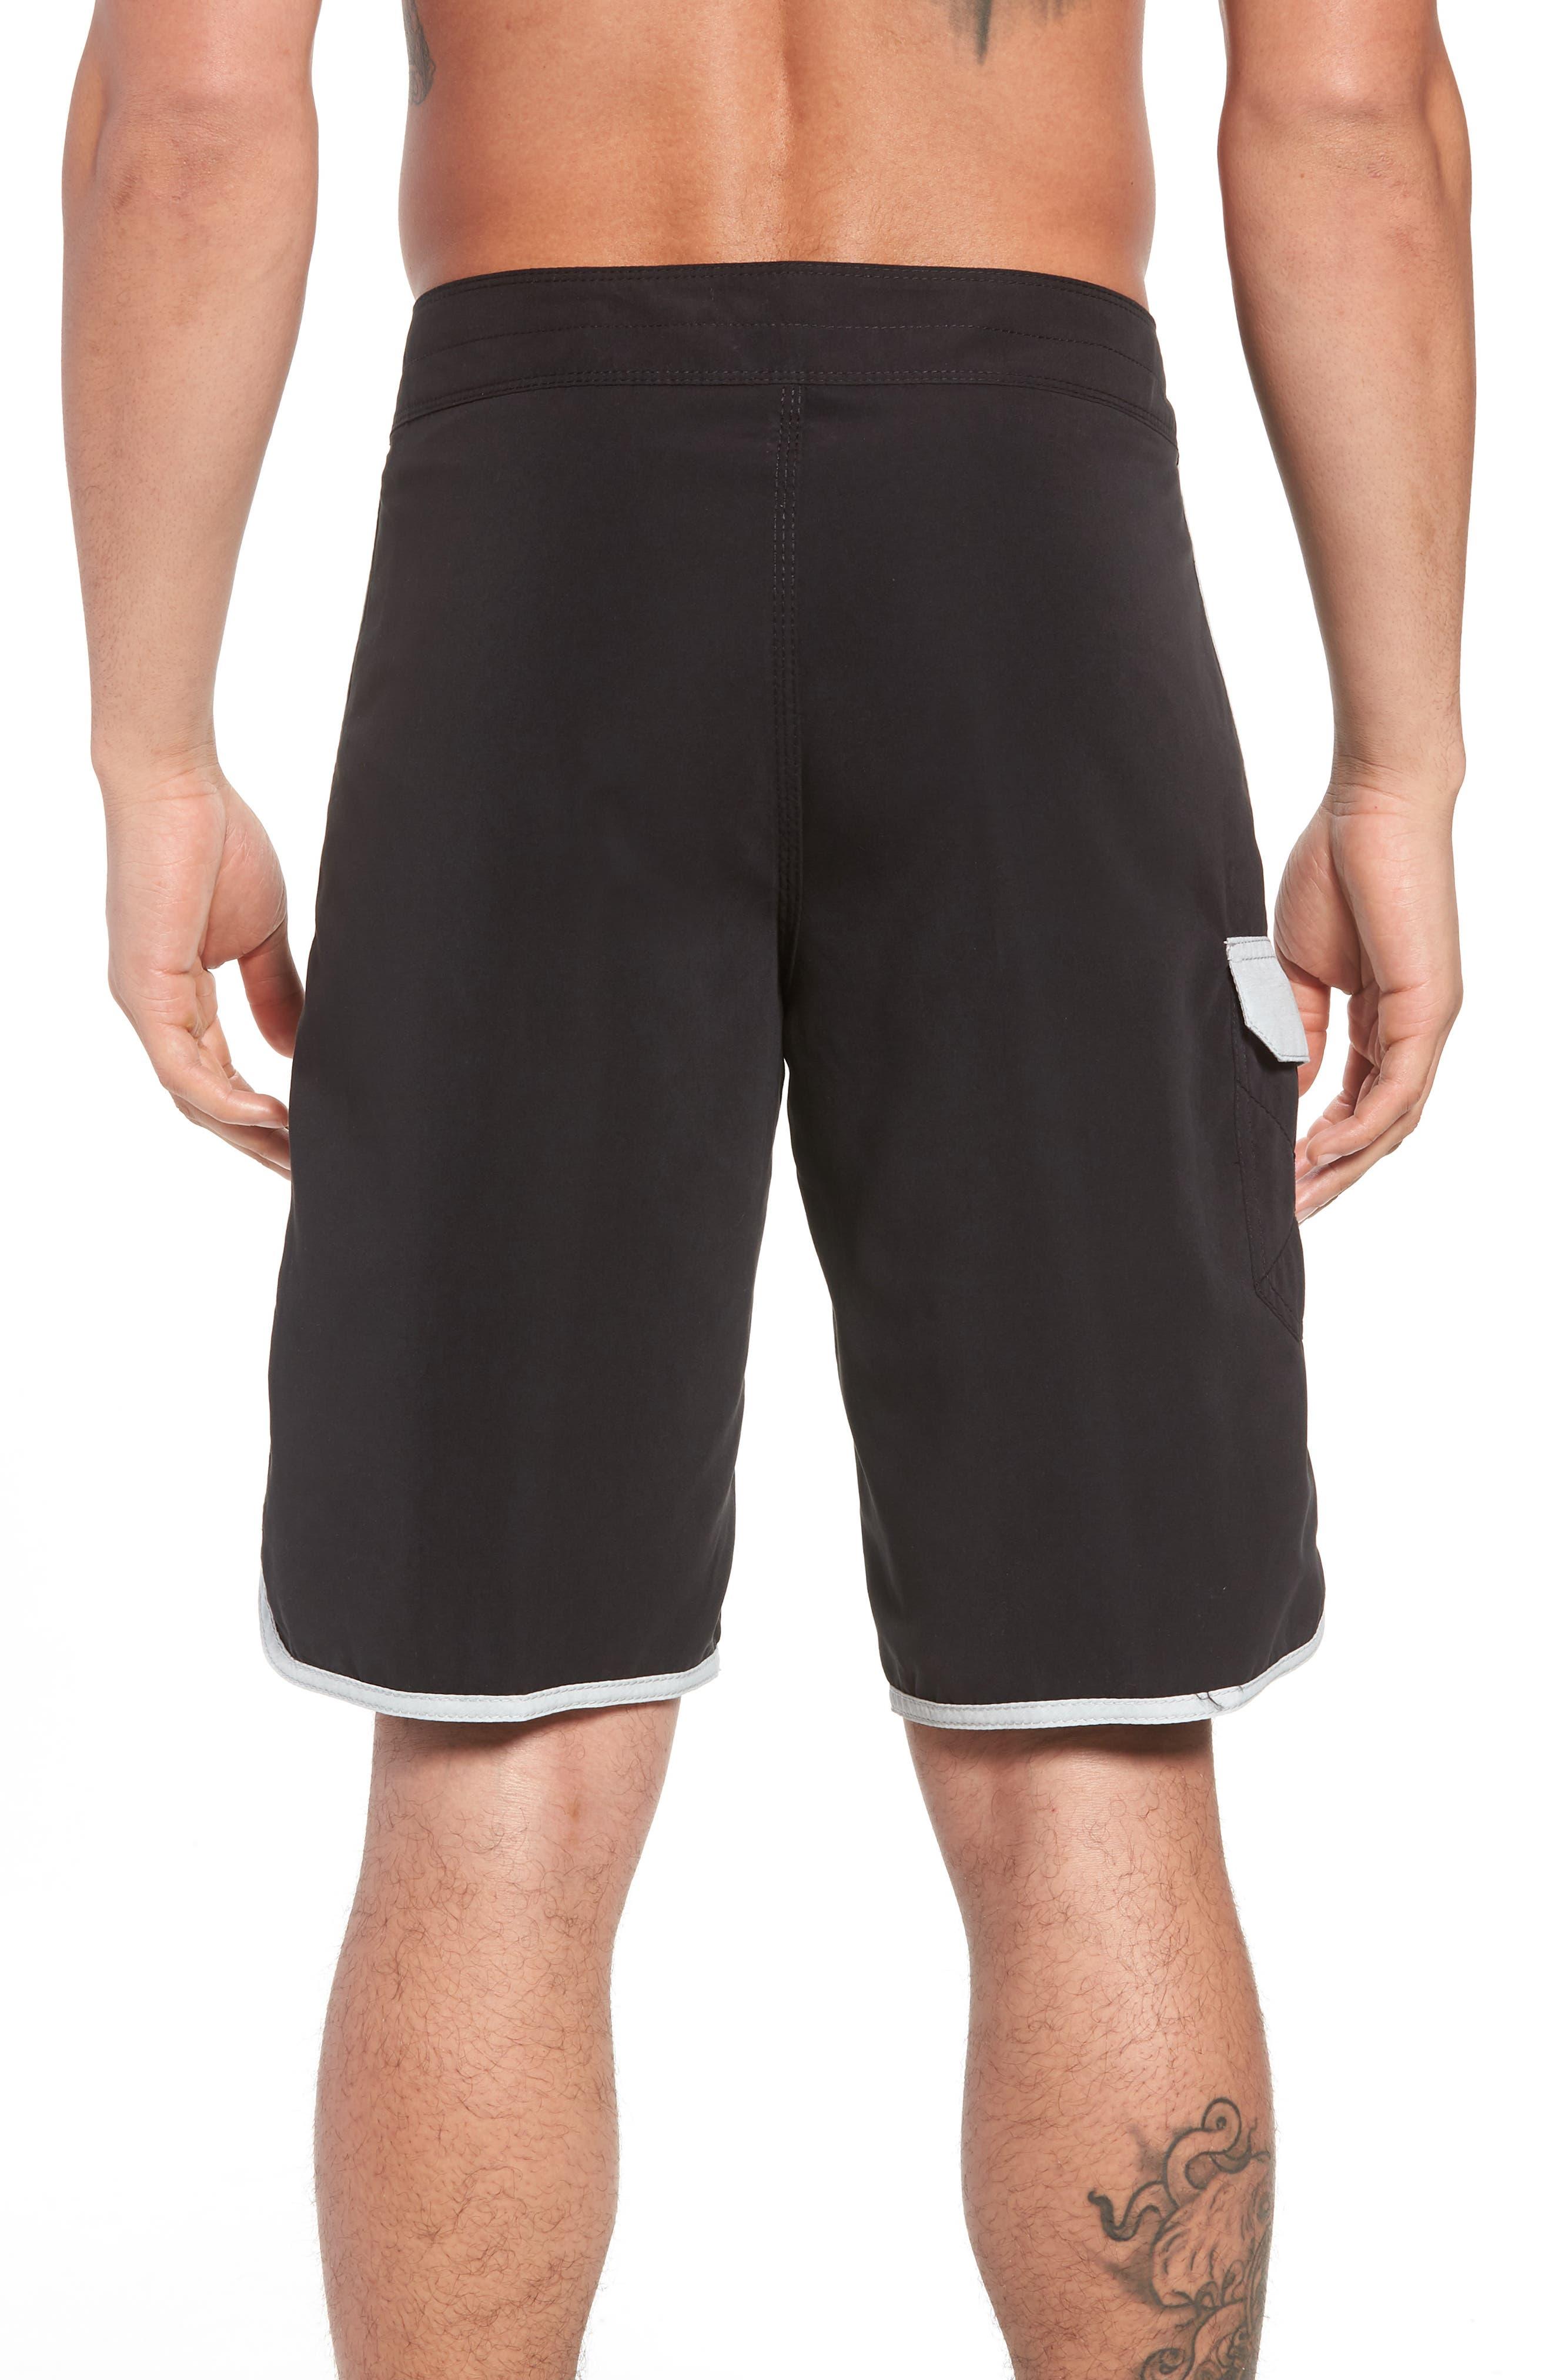 73 OG Board Shorts,                             Alternate thumbnail 2, color,                             Black